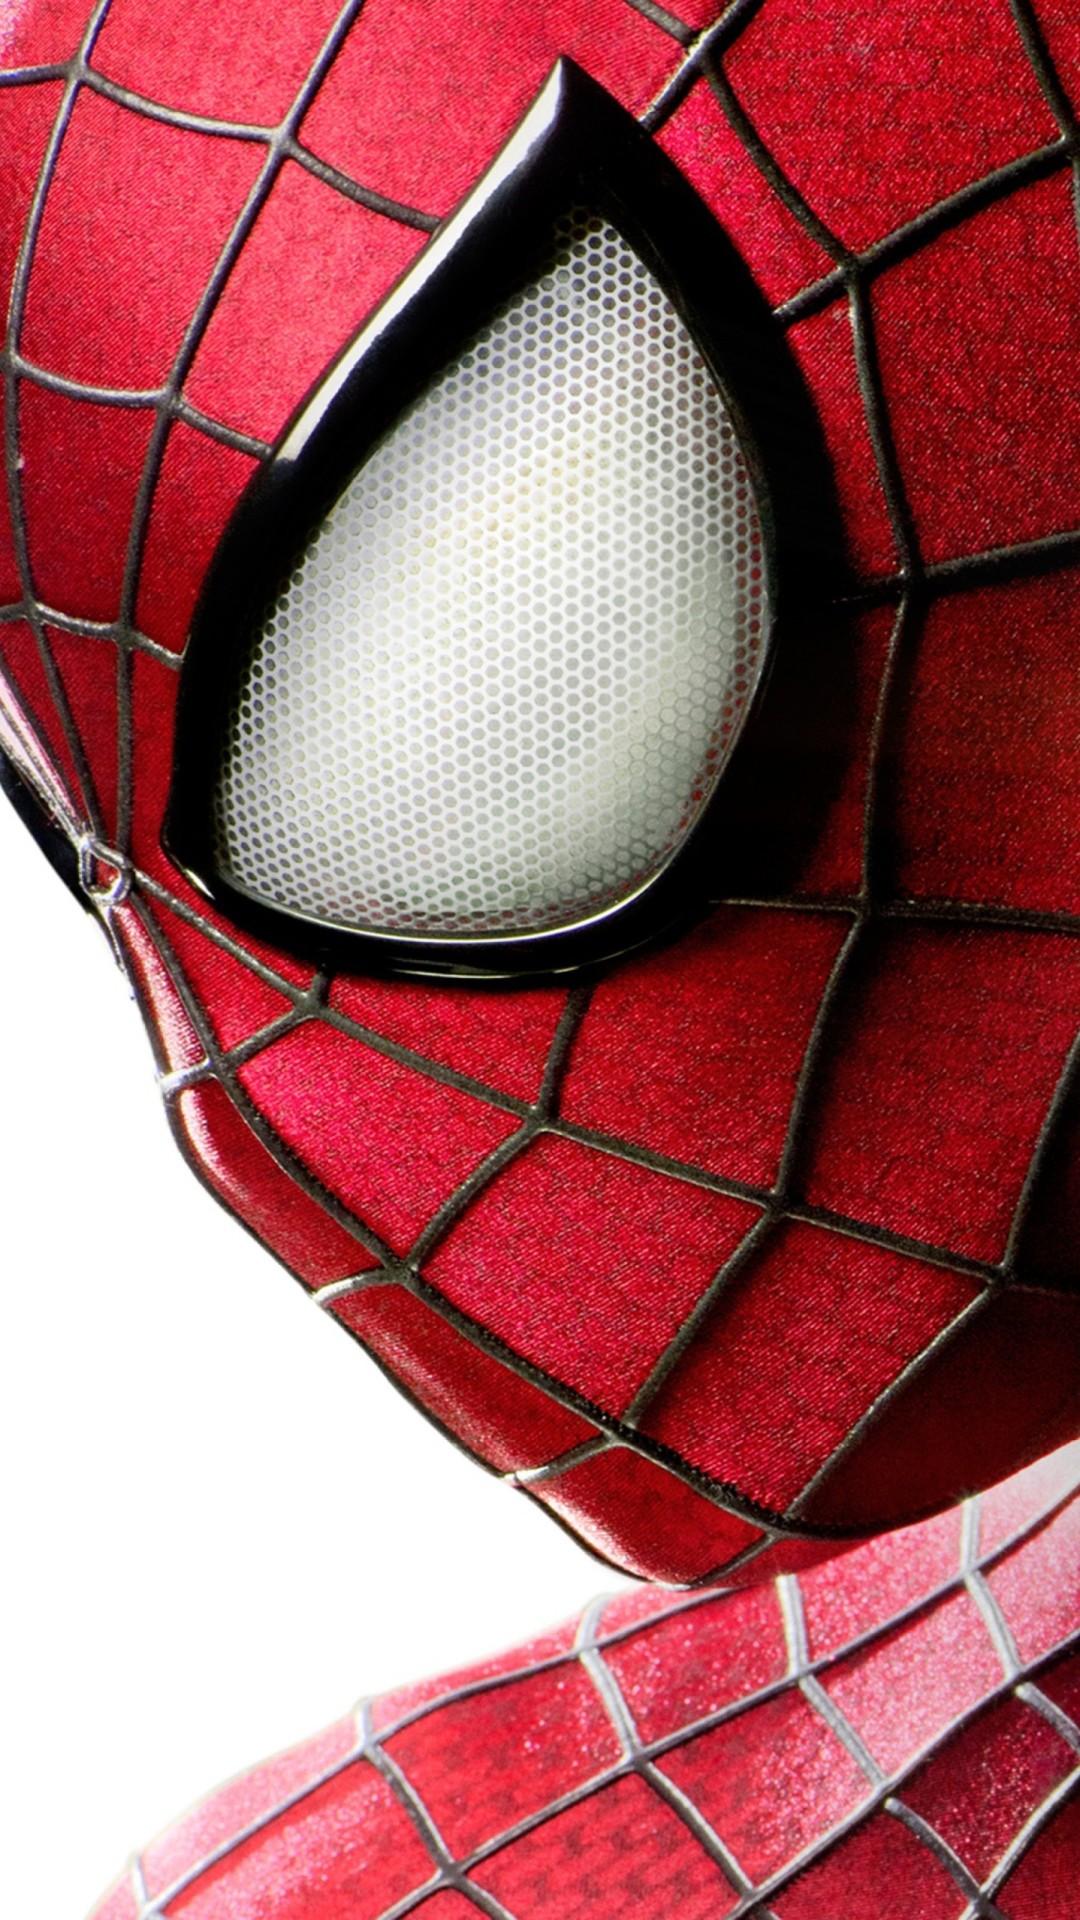 Iphone 6 Plus   Data-src - Full Hd Spiderman Wallpaper Iphone - HD Wallpaper